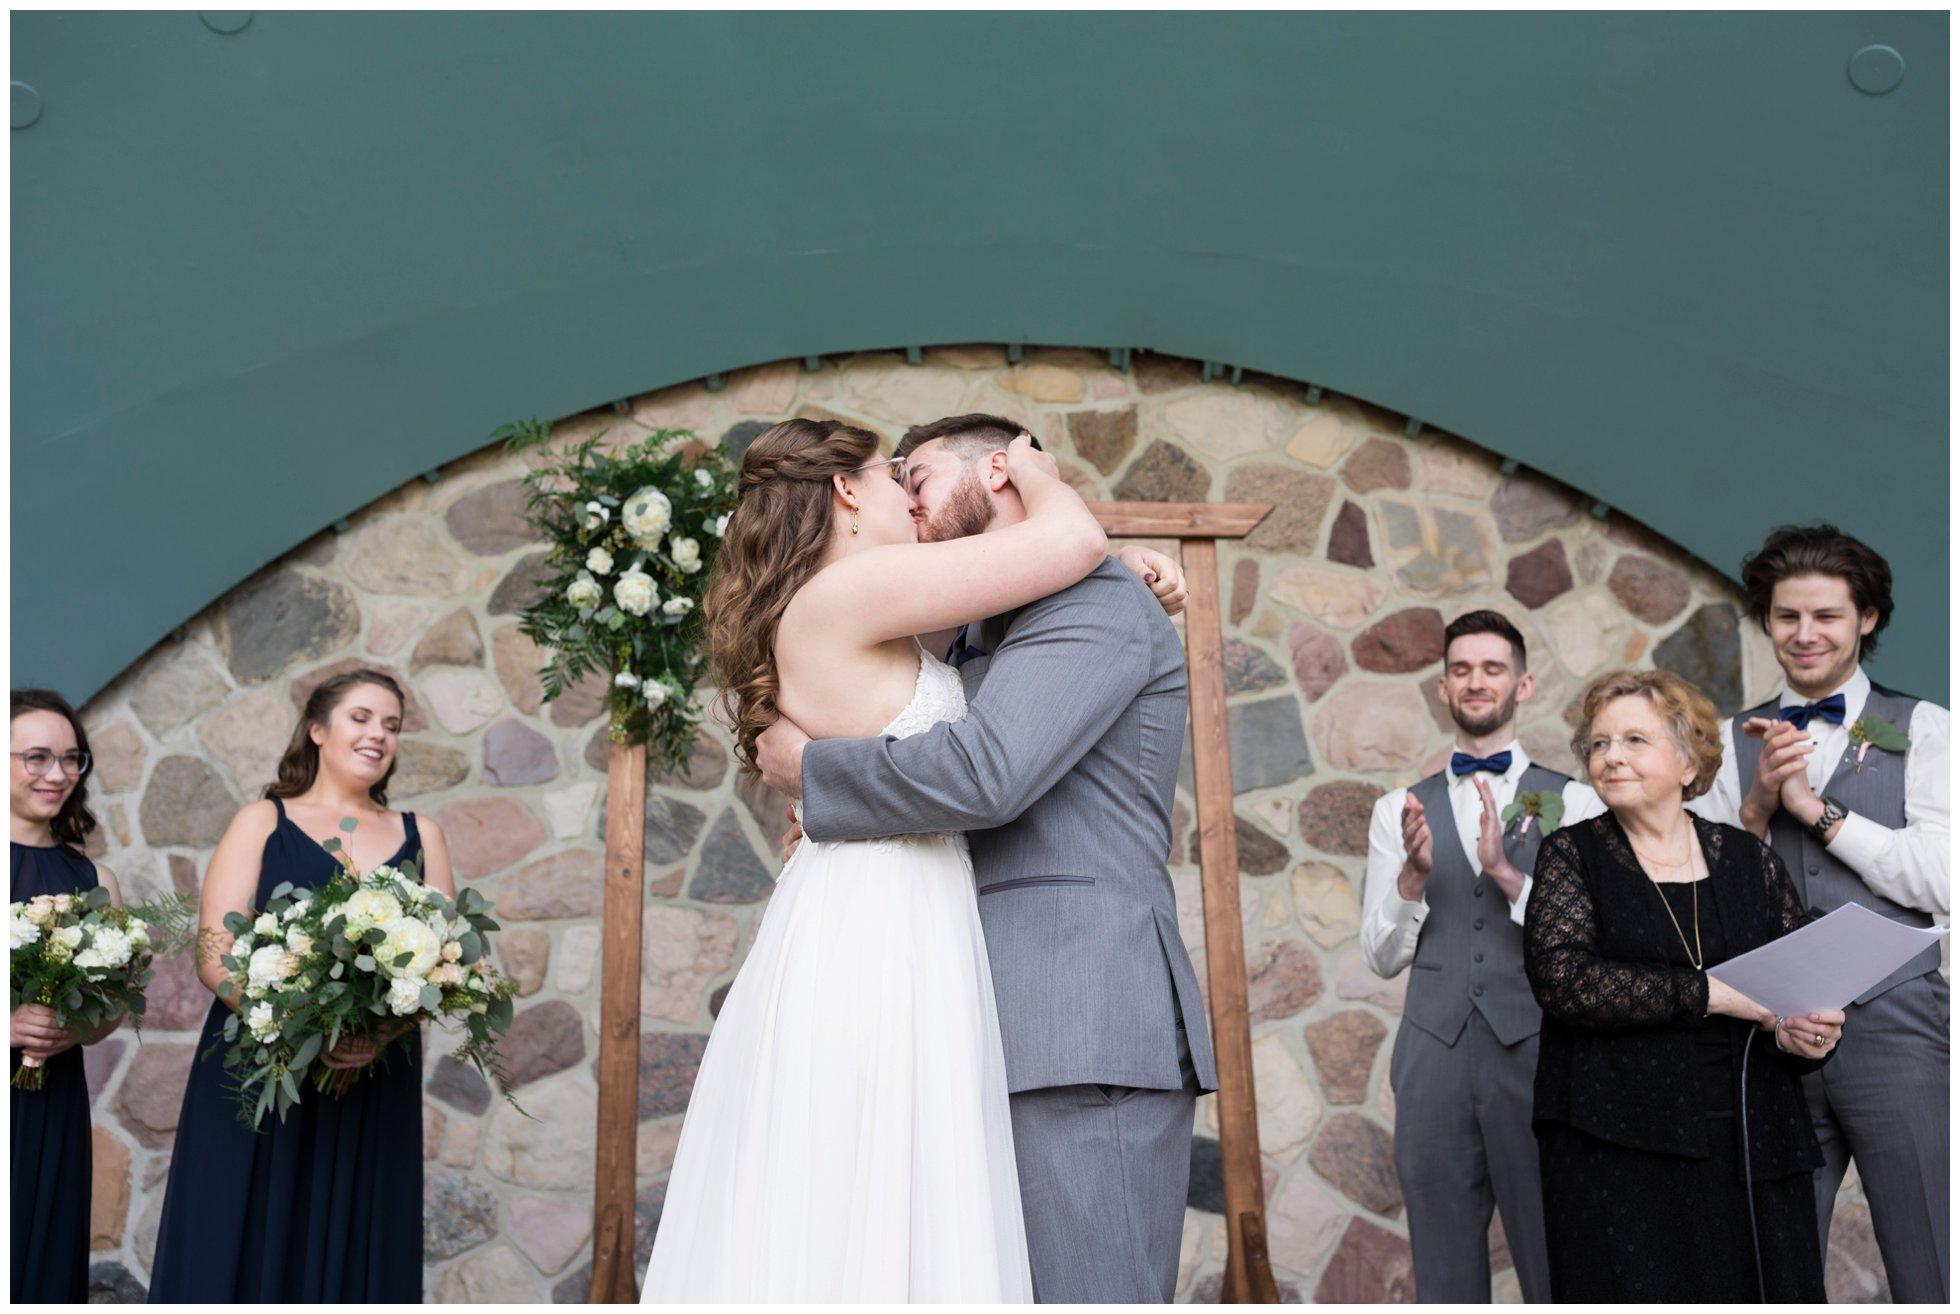 Emily and Royden Edmonton Wedding (Life by Selena Photography)_0013.jpg